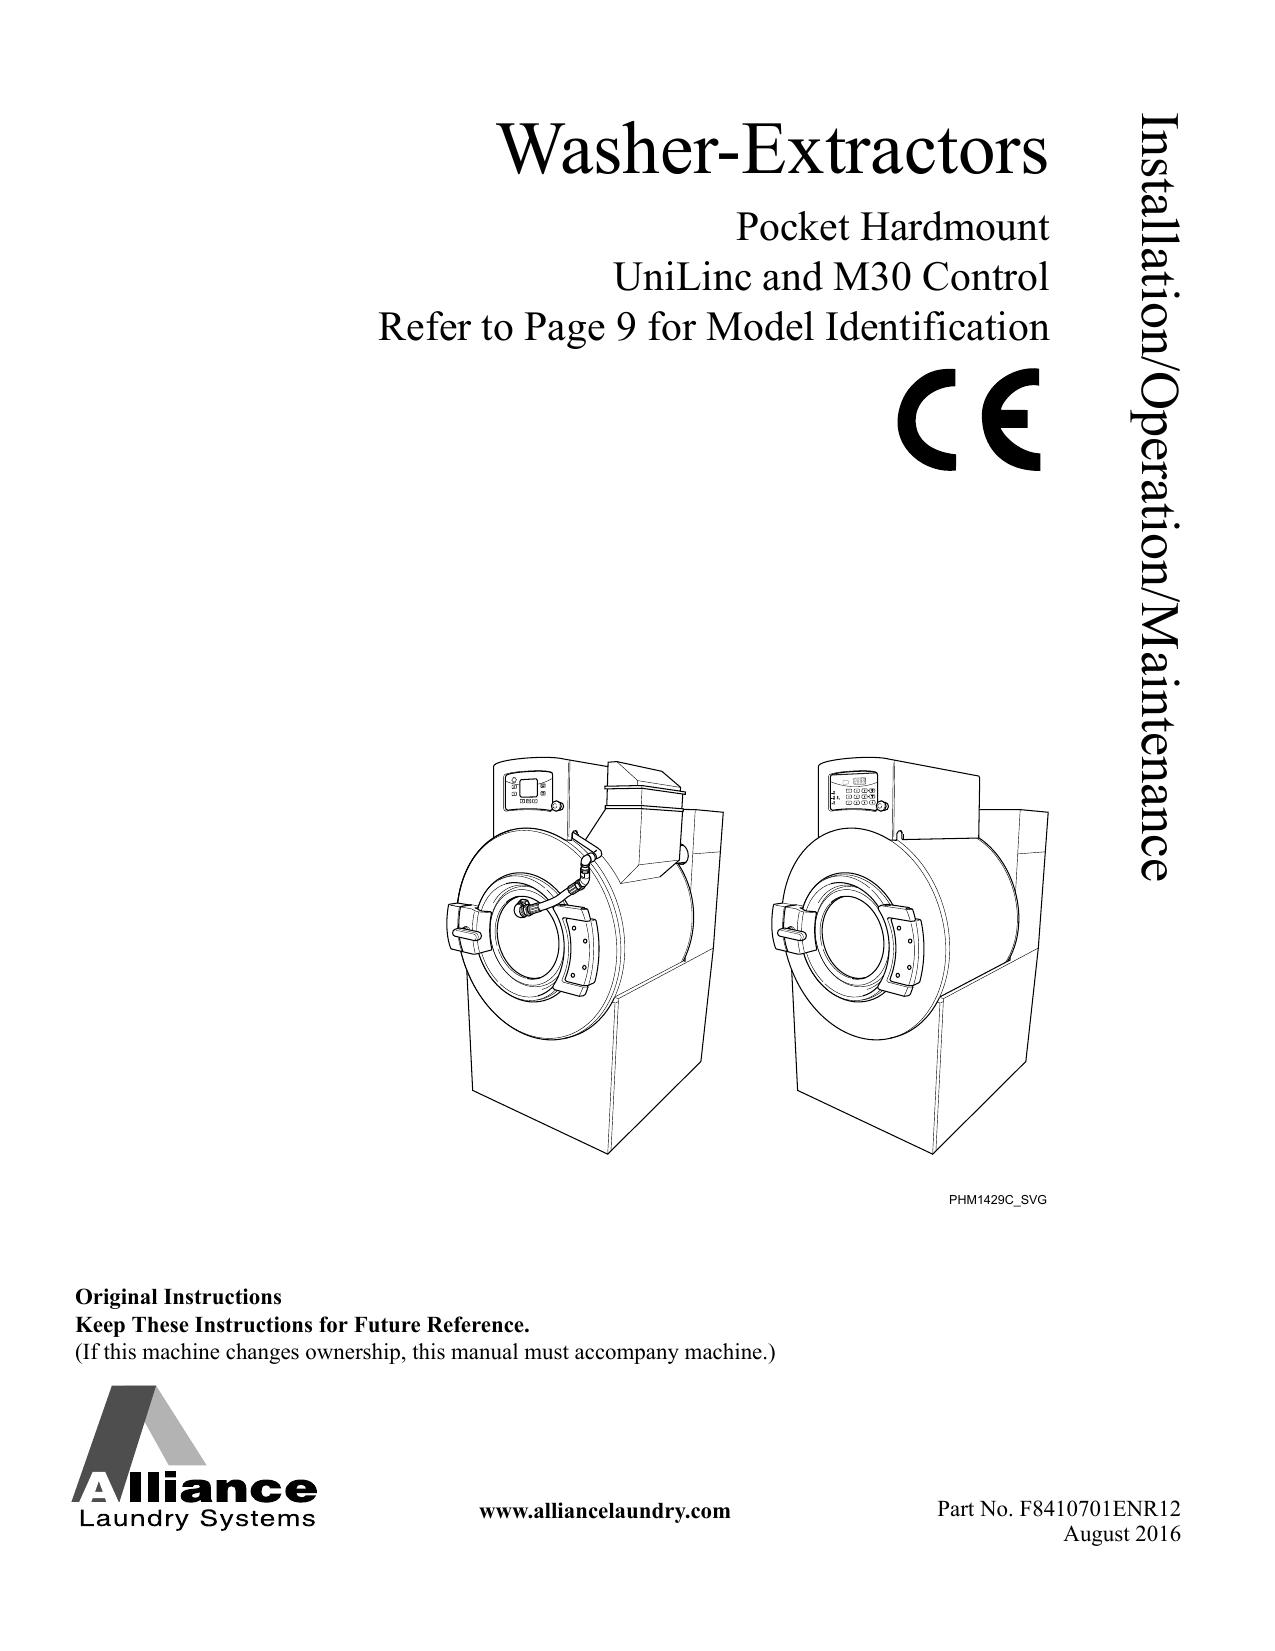 [SCHEMATICS_4LK]  UniMac UWN065T4VXU4002 Installation and Operation Manual   Manualzz   Unimac Washer Wiring Diagram      manualzz